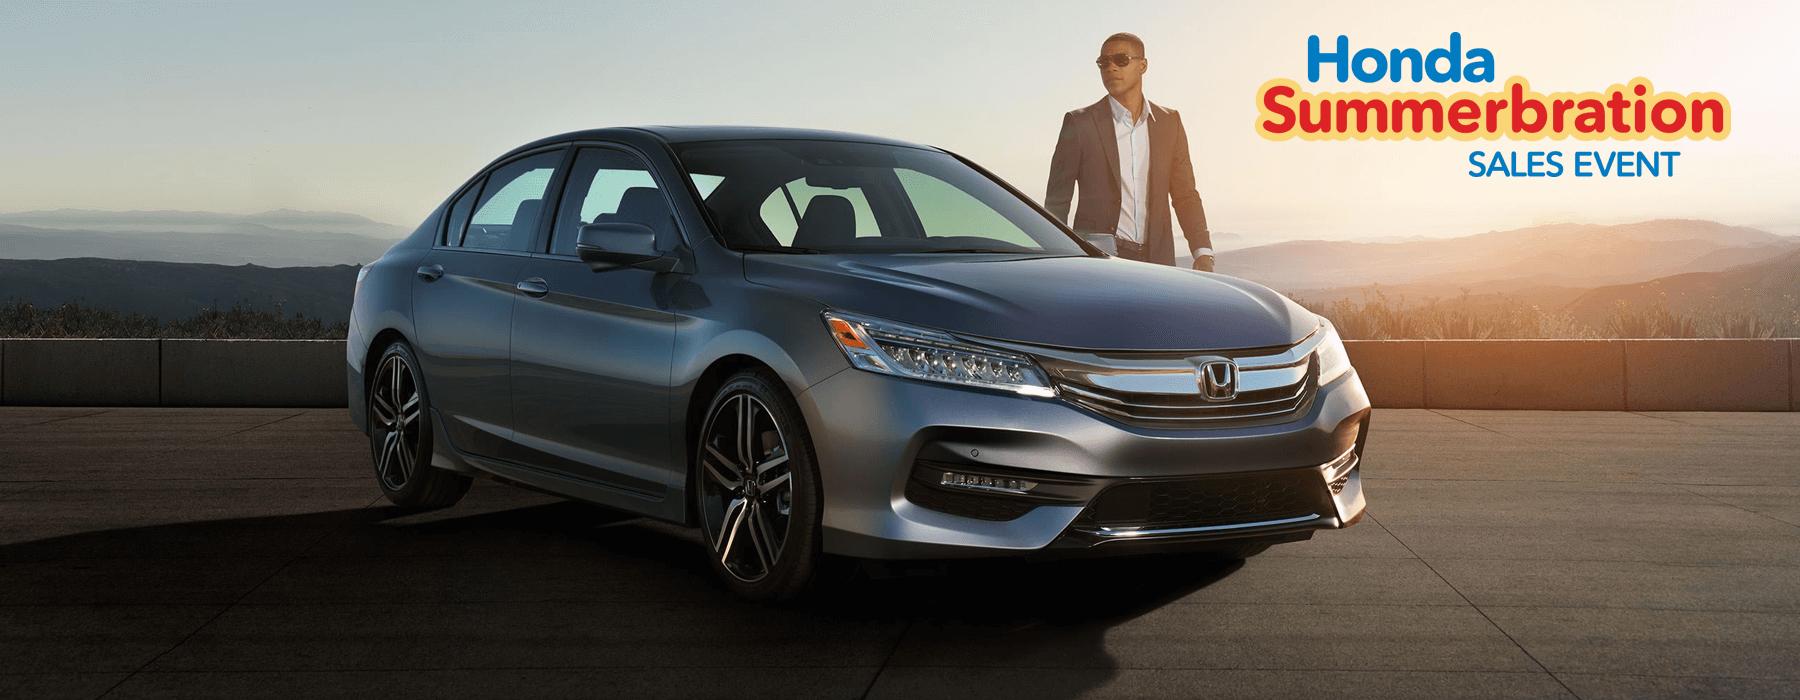 Honda Summerbration Sale 2017 Accord Sedan